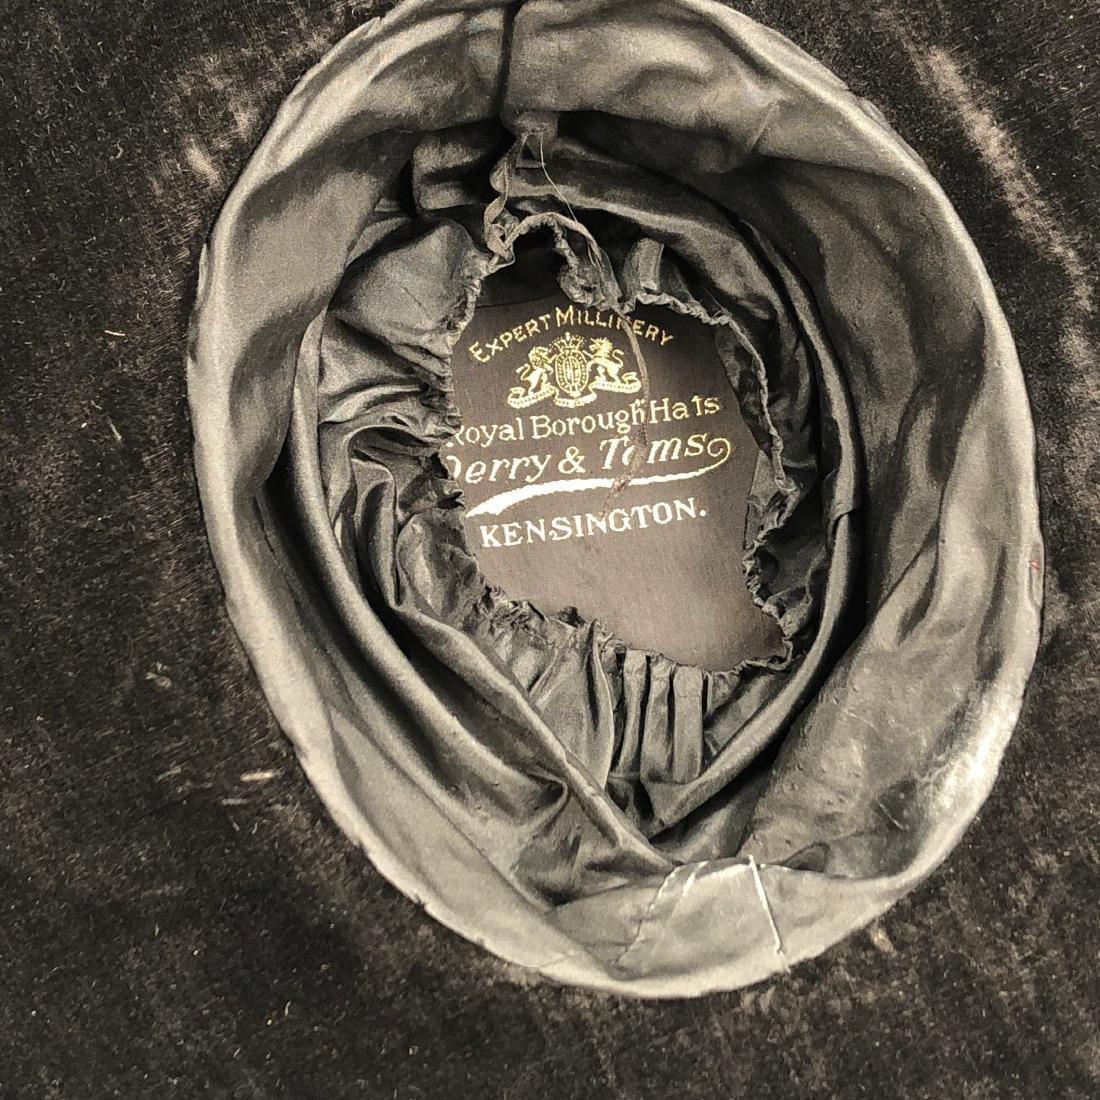 TWO BLACK VELVET WIDE-BRIM HATS, c. 1918 - 6